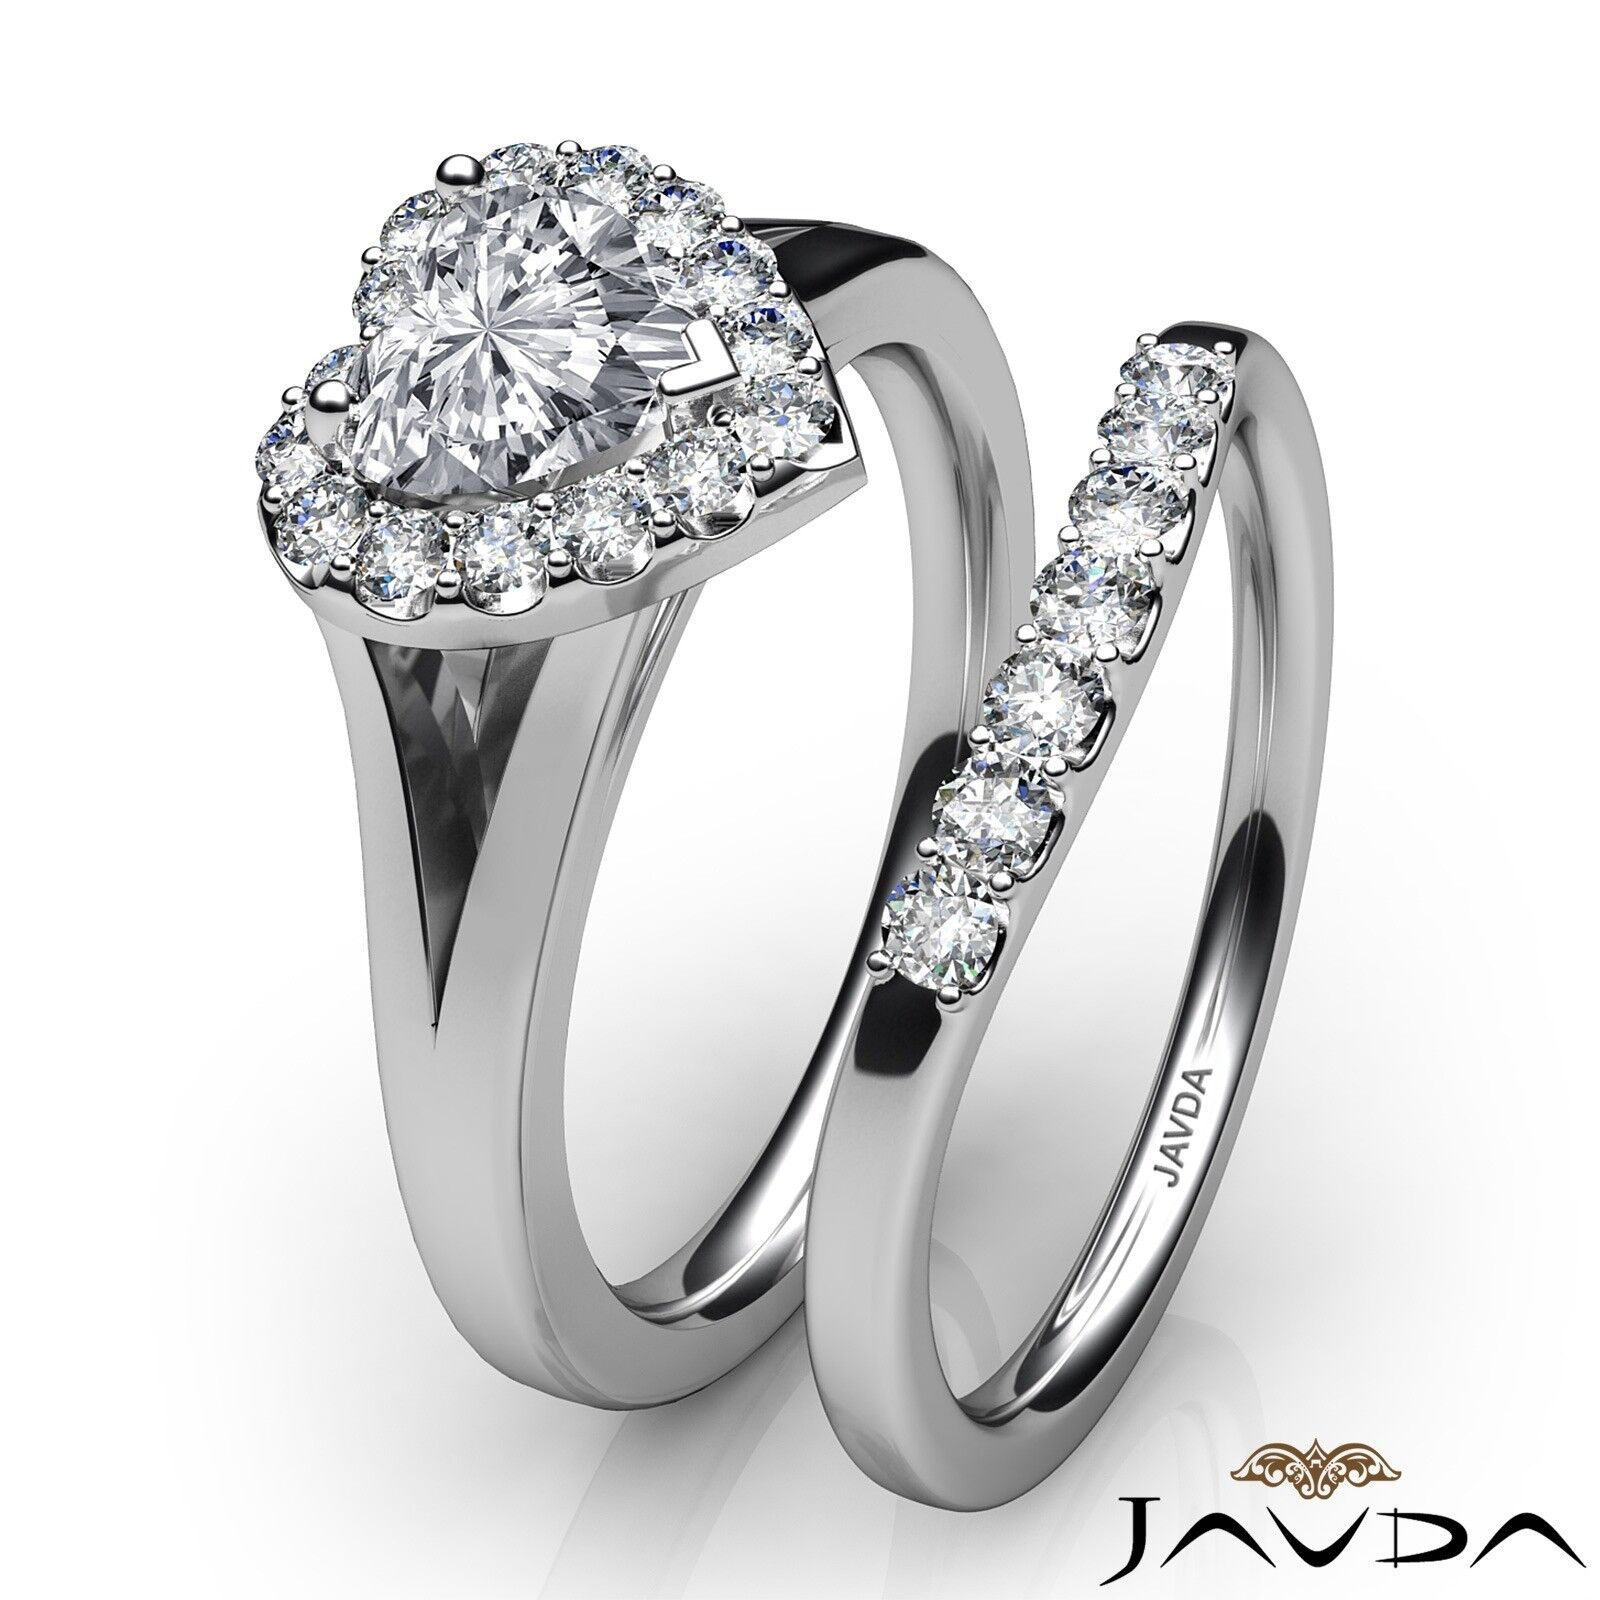 1.22ctw Pave Halo Bridal Set Heart Diamond Engagement Ring GIA G-VVS2 White Gold 3